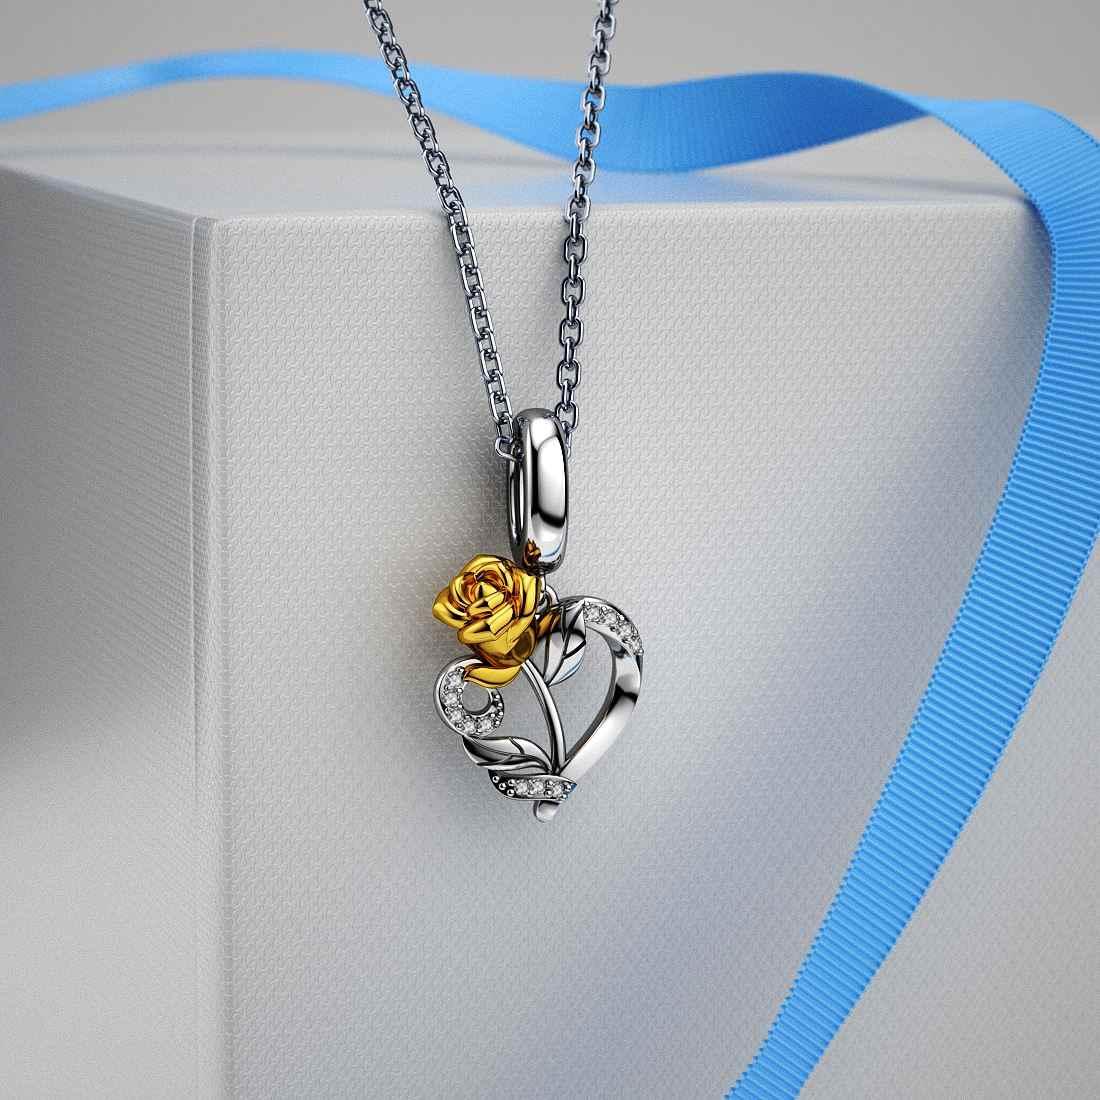 Jiayiqi רומנטי עלה פרחים 925 סטרלינג כסף קסמי חרוזים Fit פנדורה קסמי כסף 925 מקורי Valentine's Day תכשיטים